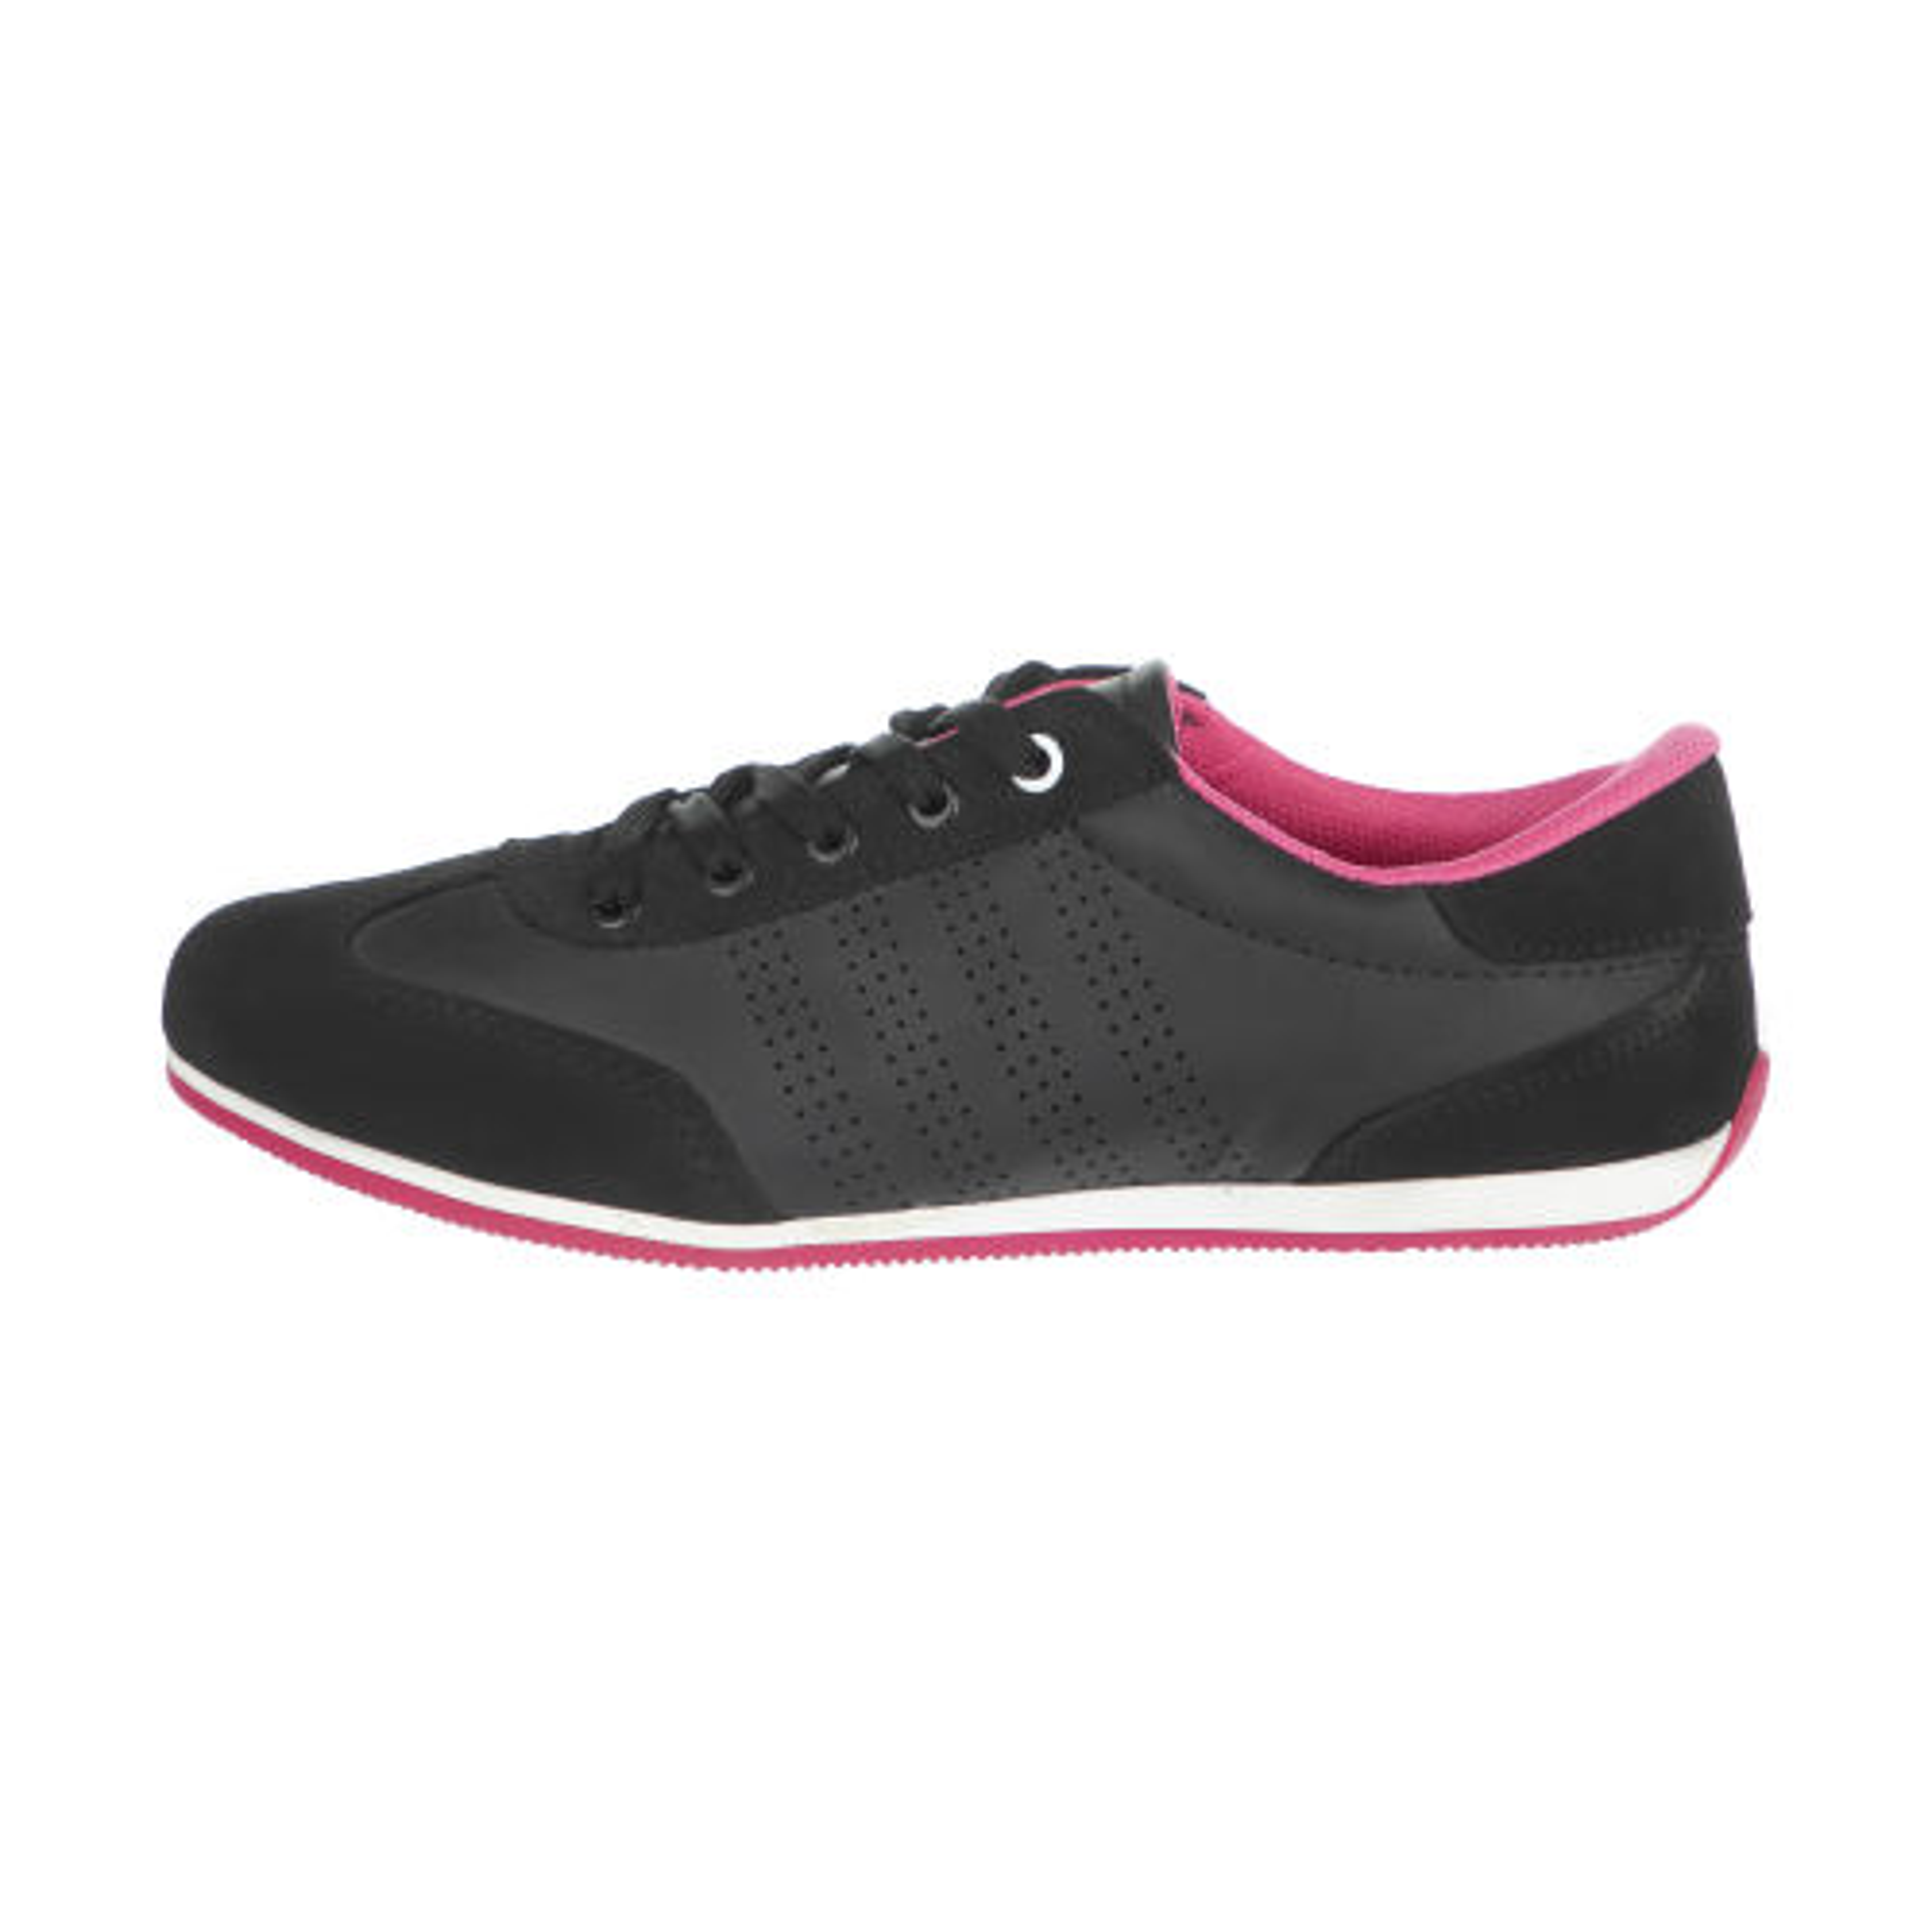 کفش روزمره زنانه آرت بلا مدل 100316417-101